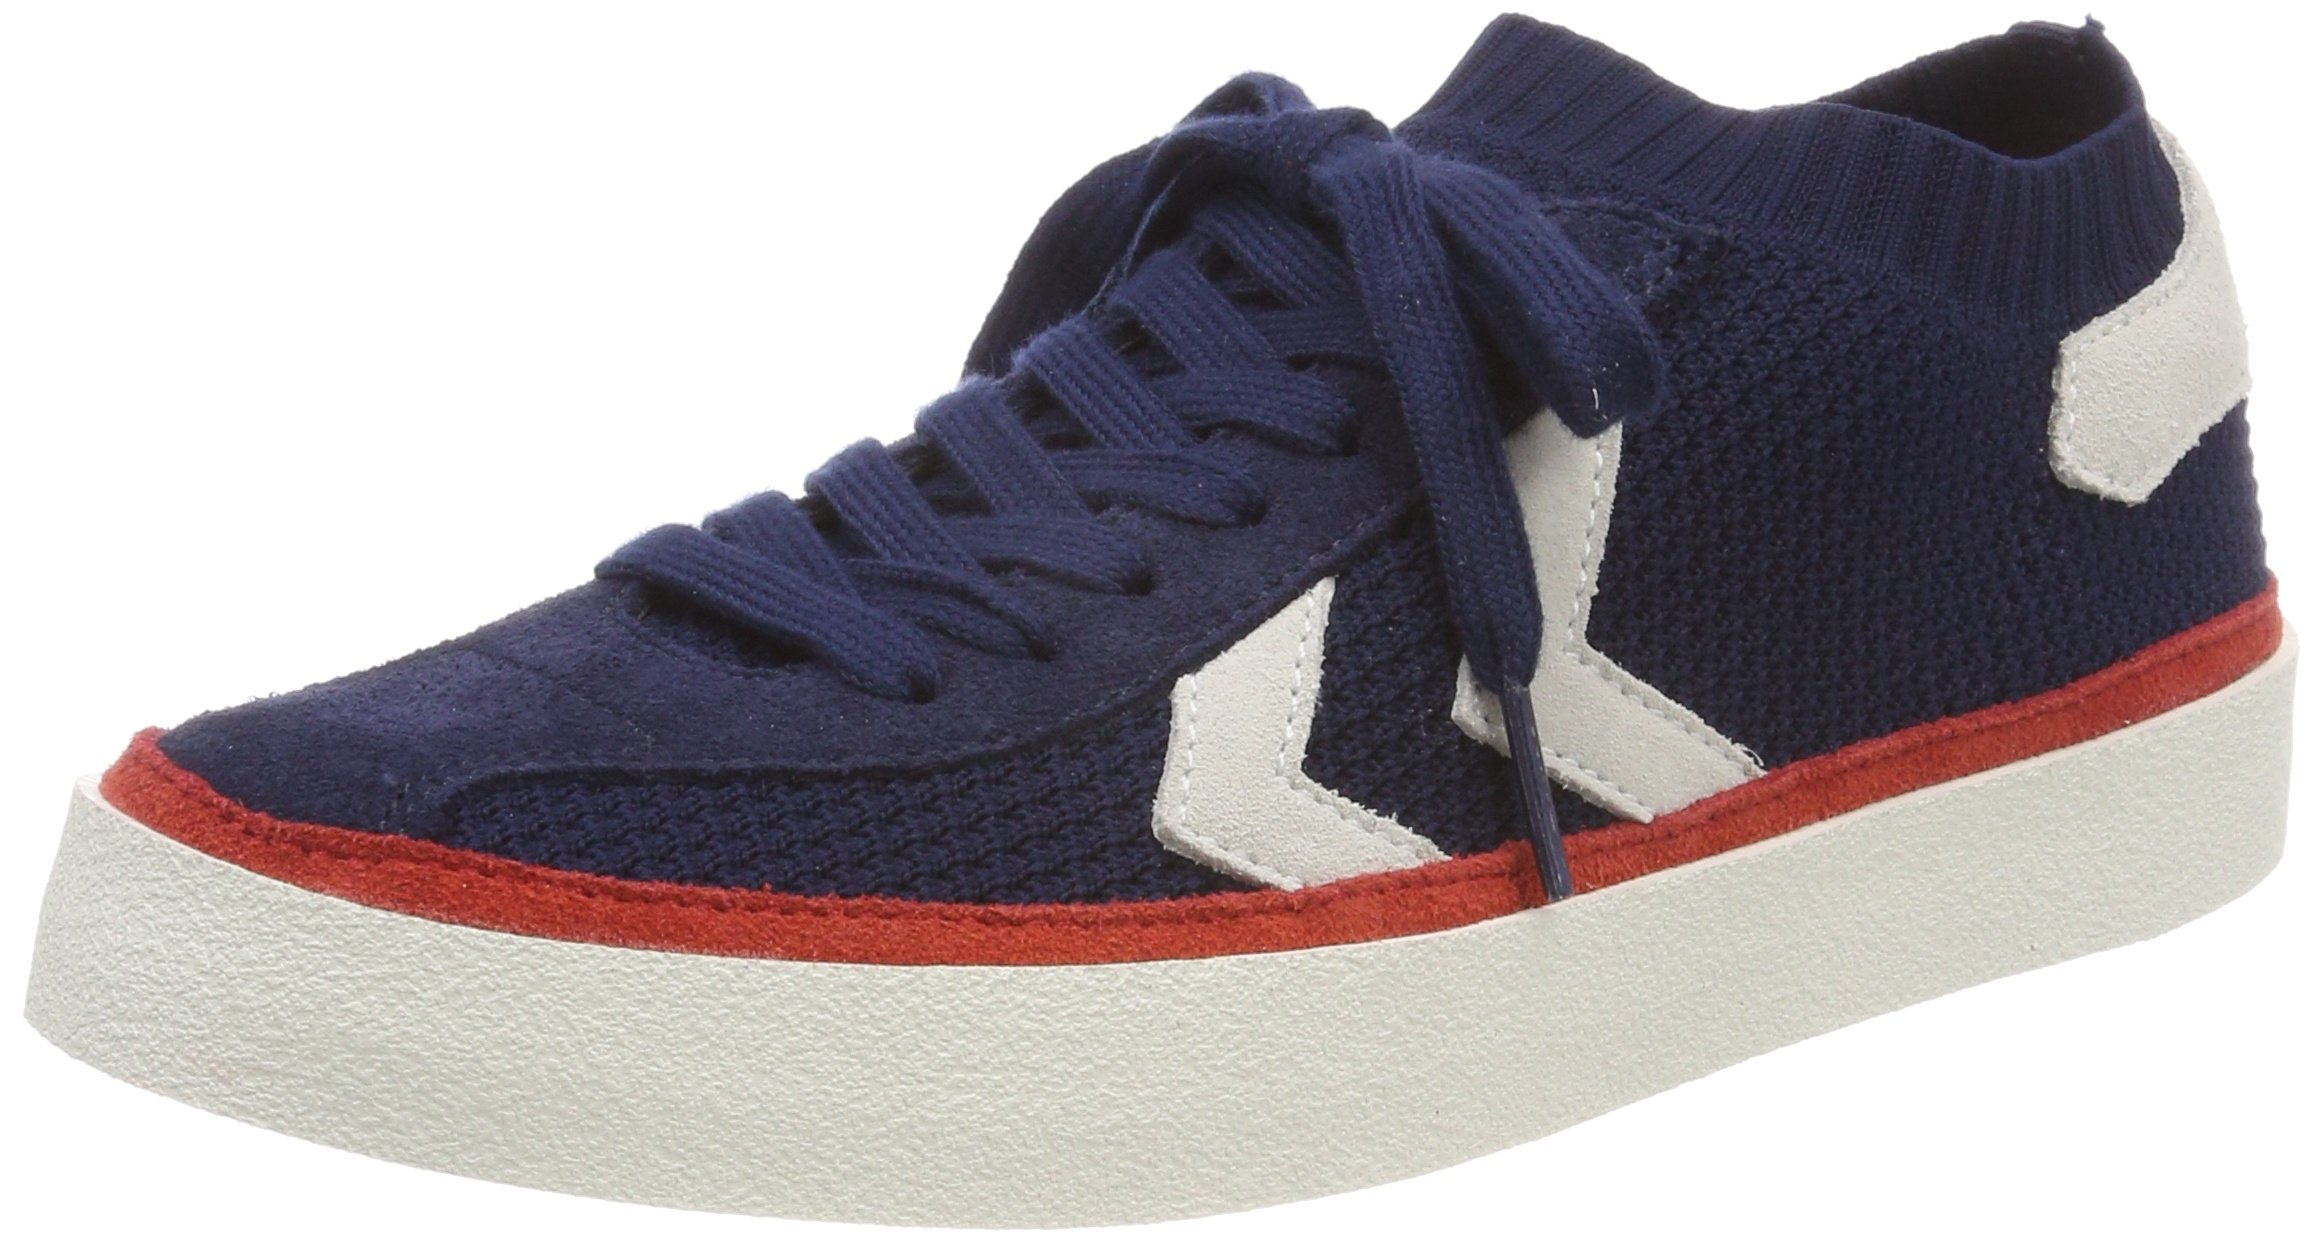 Hummel Unisex Adults' Diamant Knit Trainers, Blue (Peacoat 7666), 6.5 UK